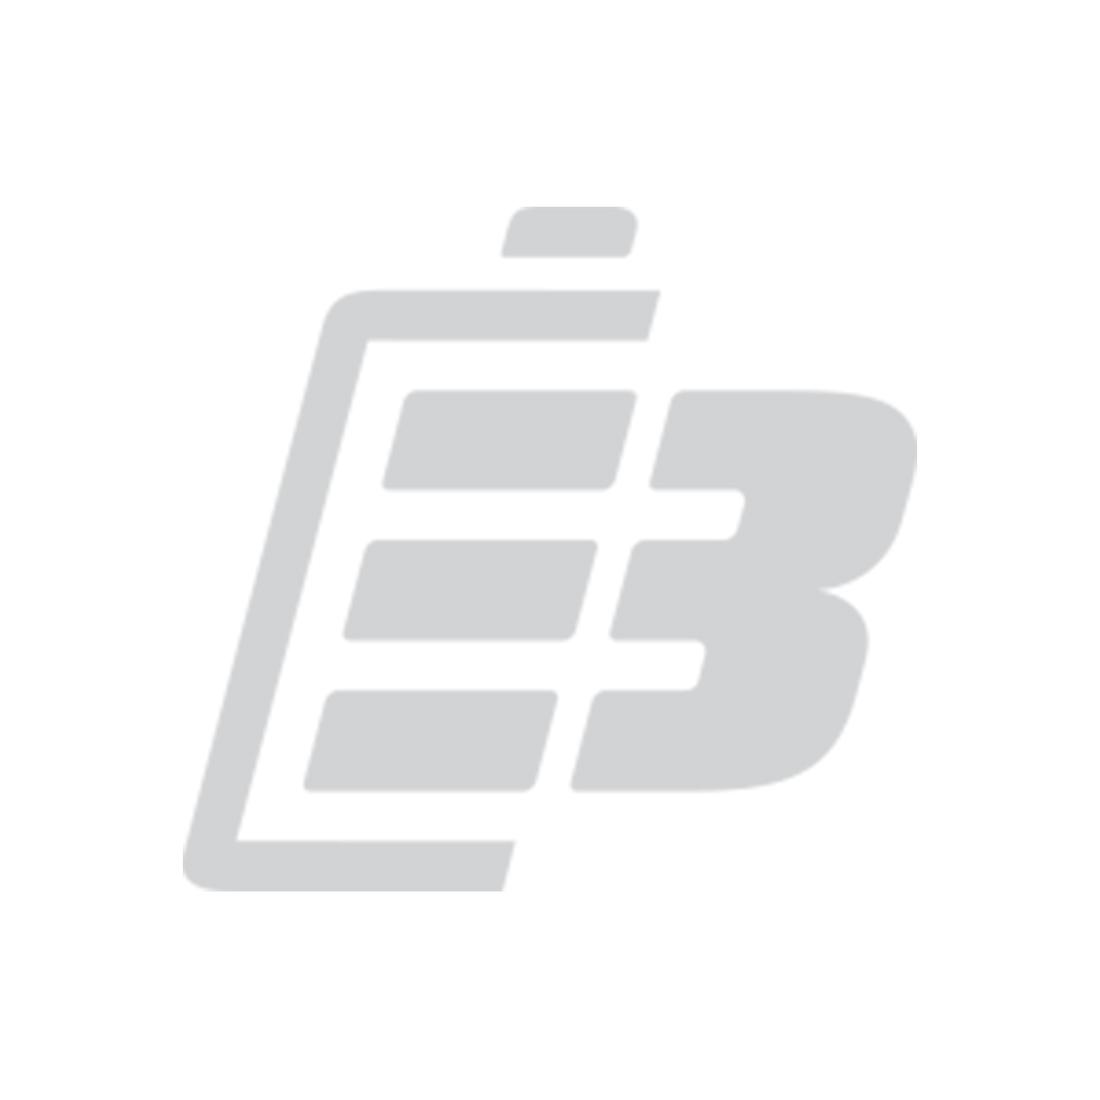 CR2450N Lithium battery Renata 3V